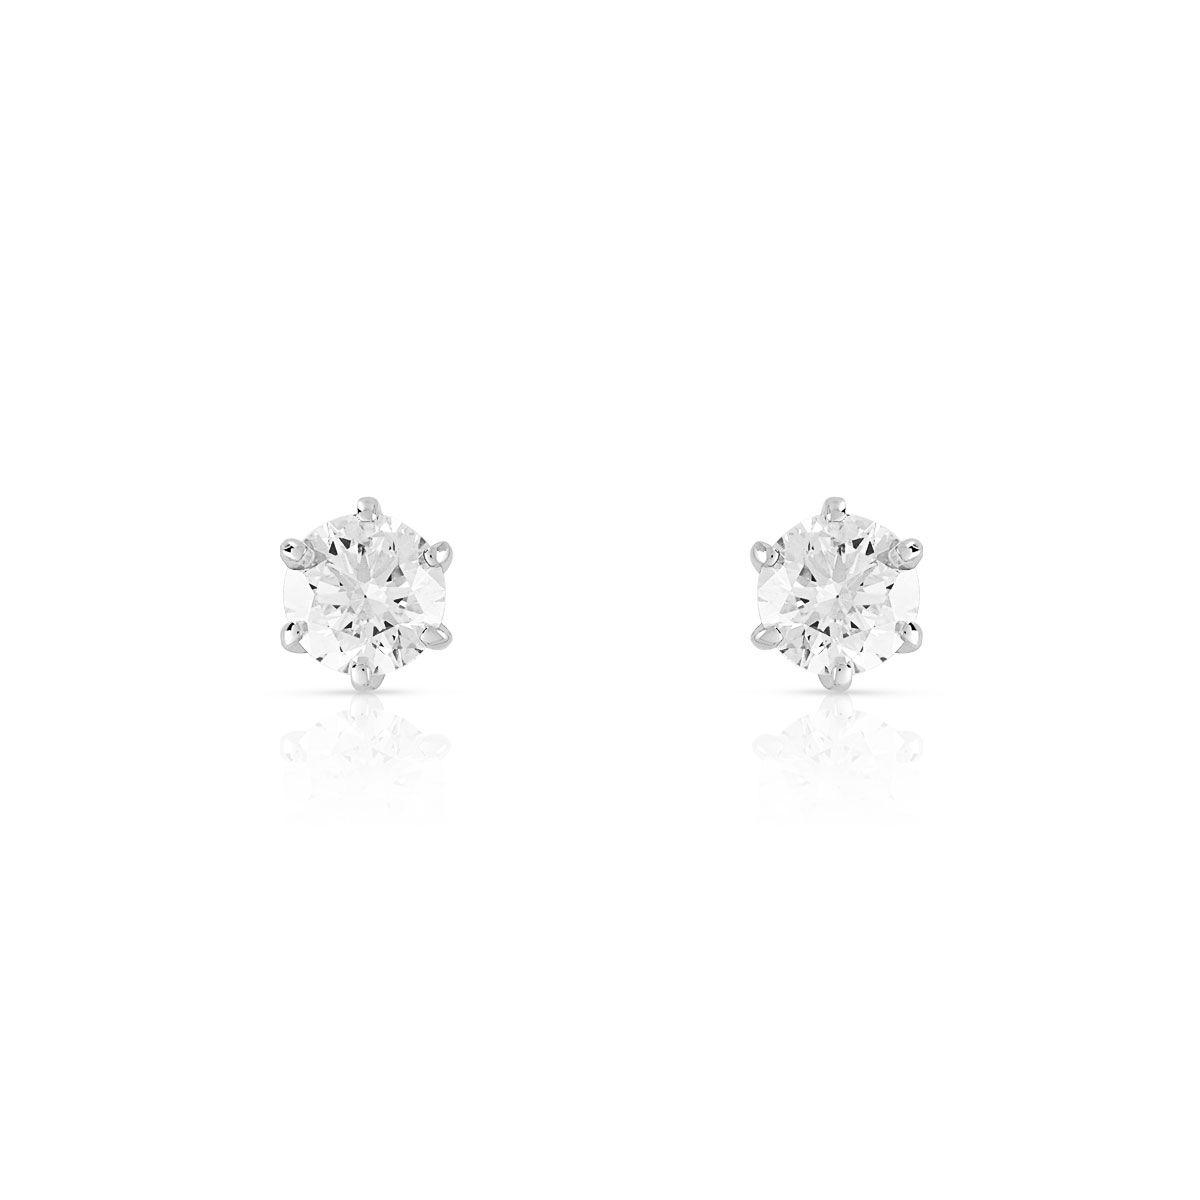 MATY Boucles d'oreilles or 750 blanc diamants synthétiques 0.50 carat- MATY